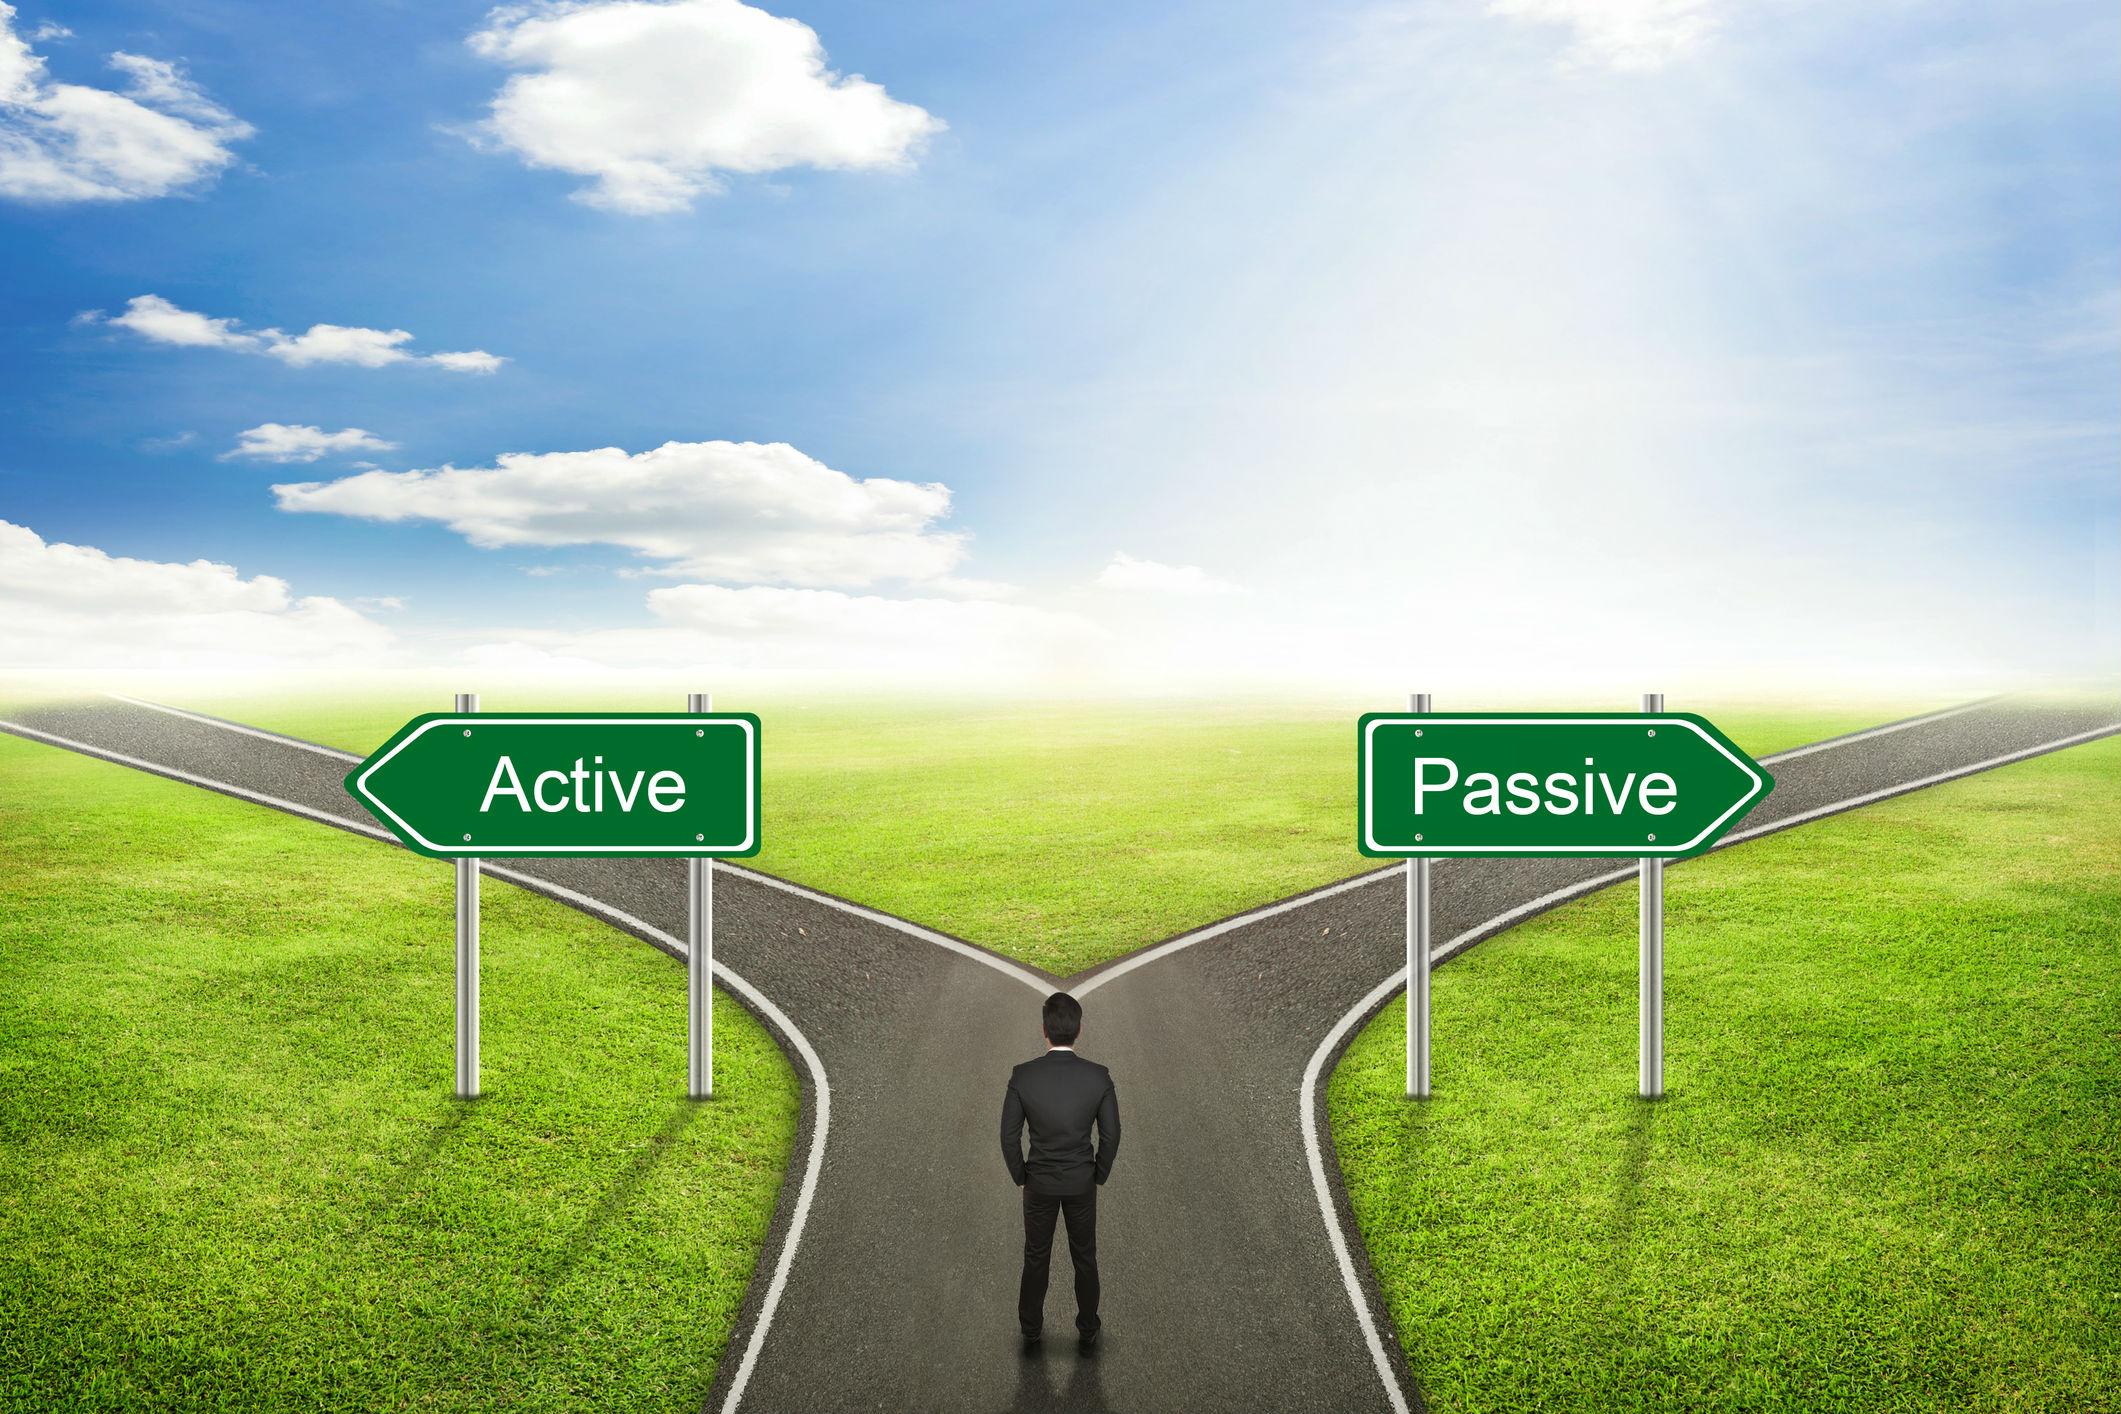 PassiveVsActive_lowres.jpg